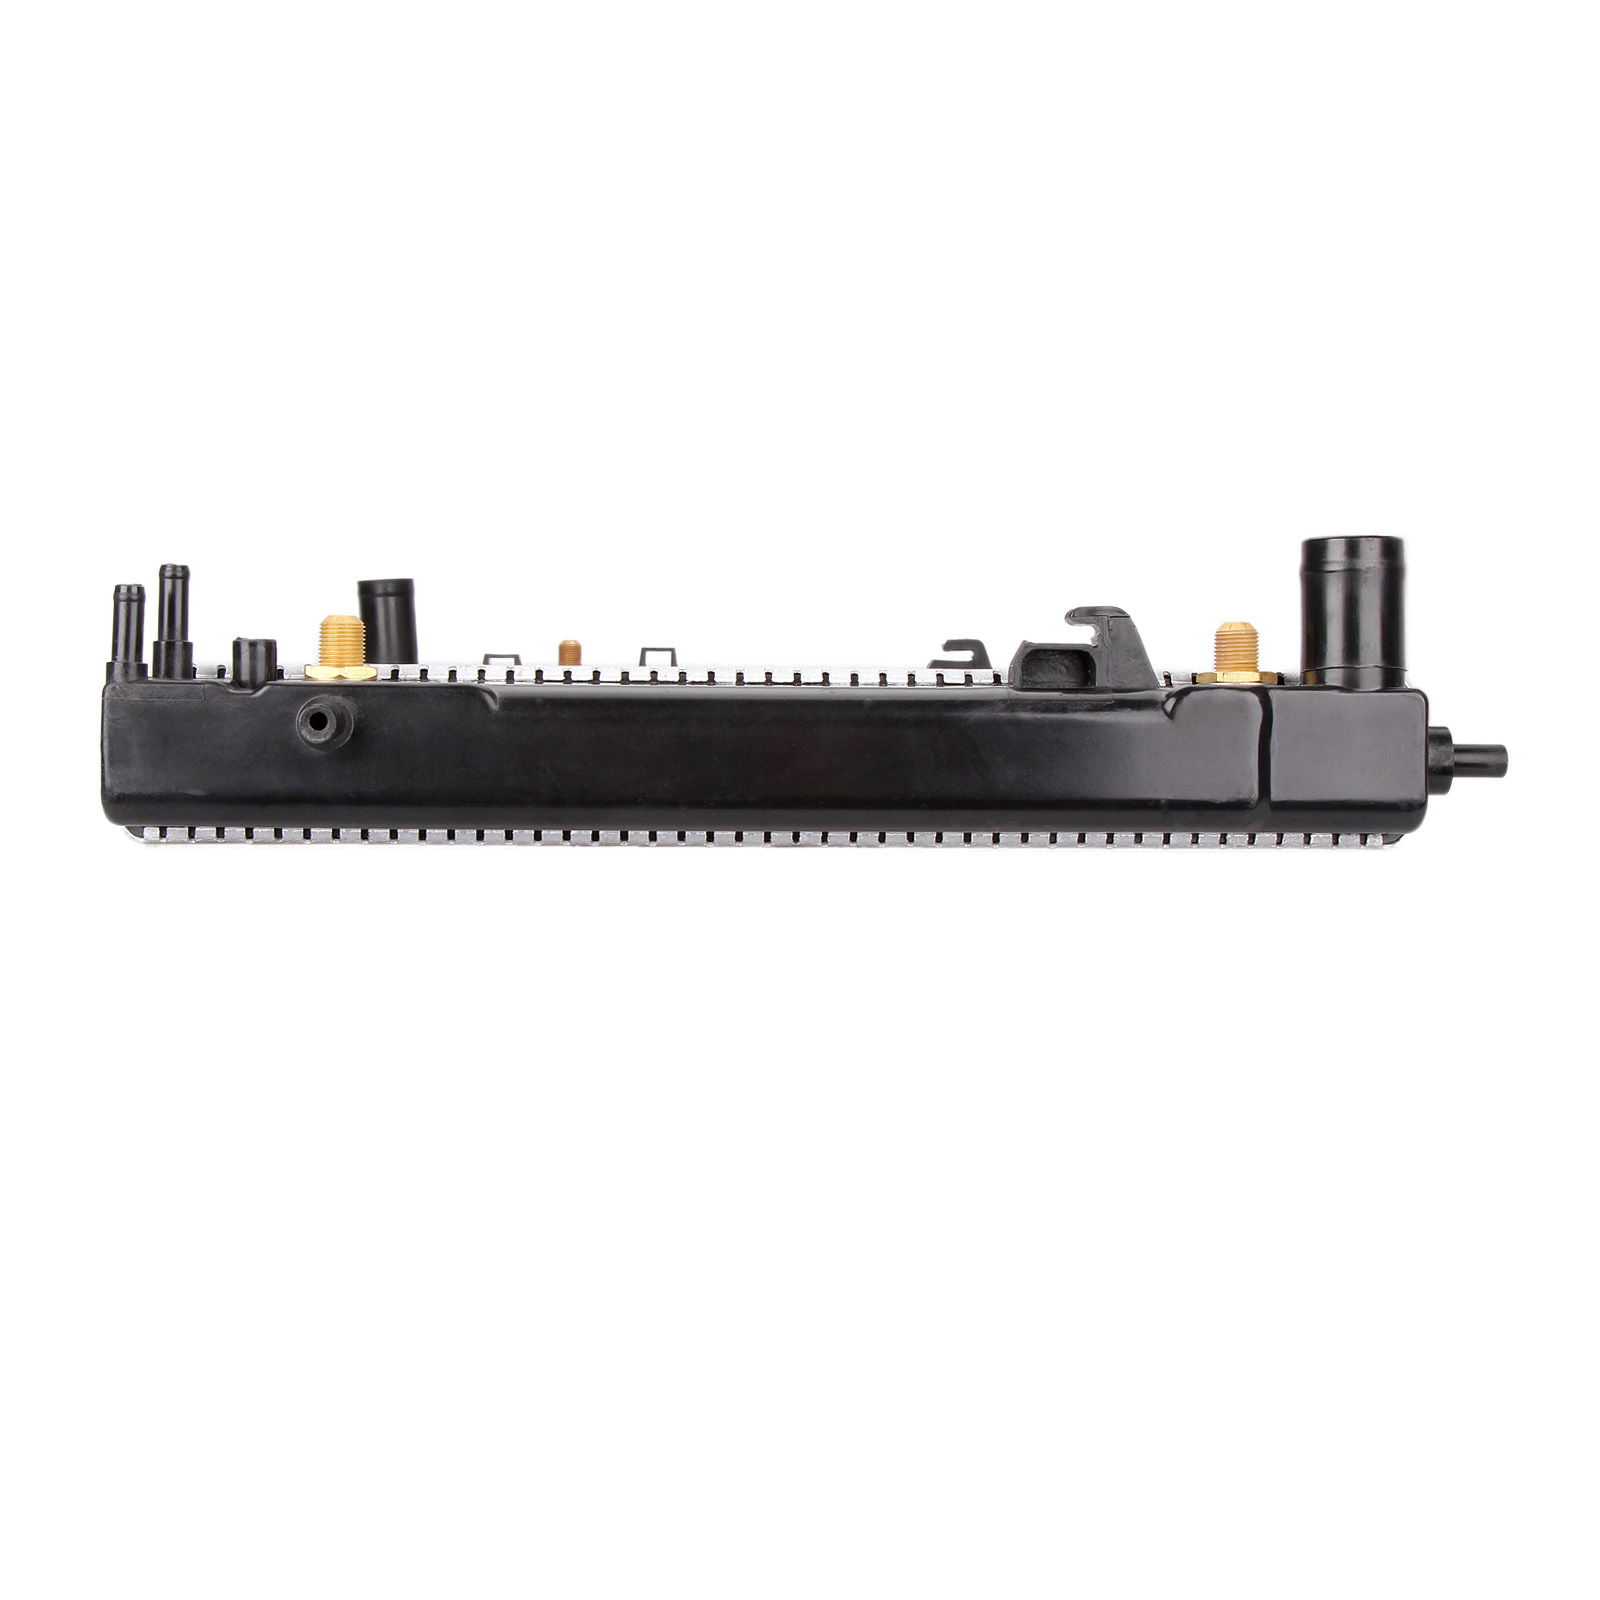 Hot 57l holden radiator quality vt Dromedary Brand